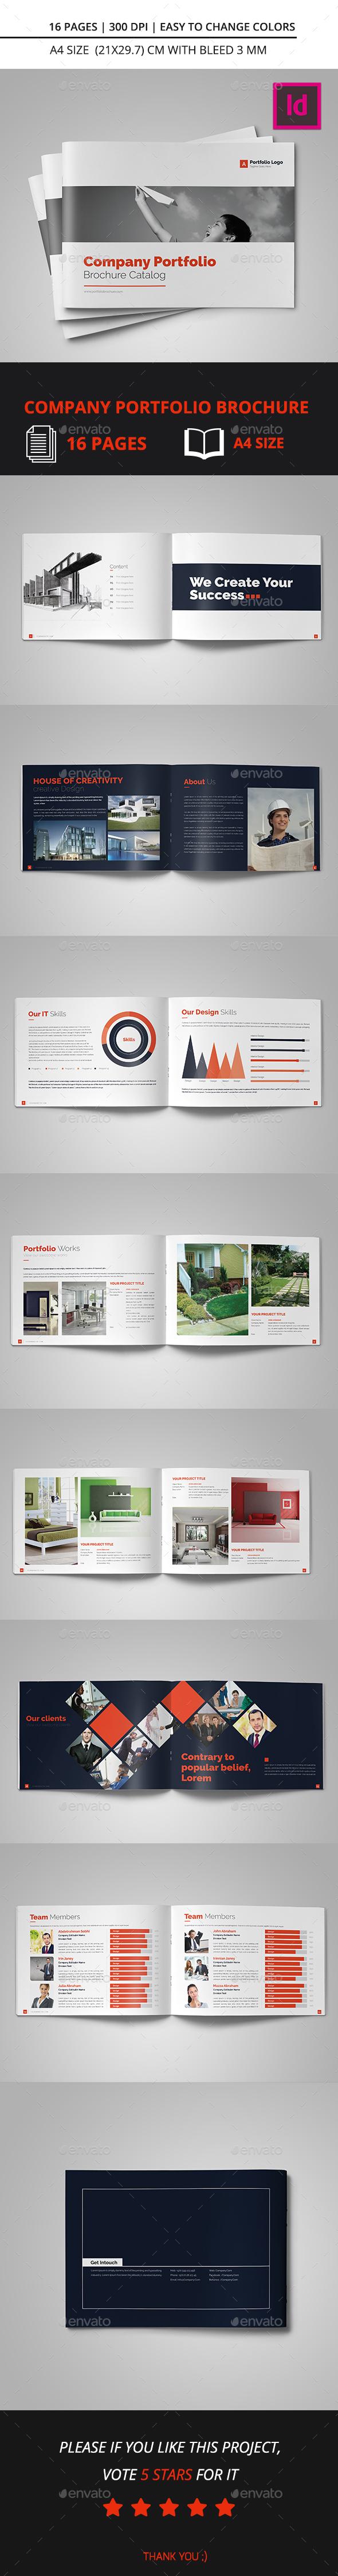 Company Portfolio Brochure Catalog 2016 - Catalogs Brochures